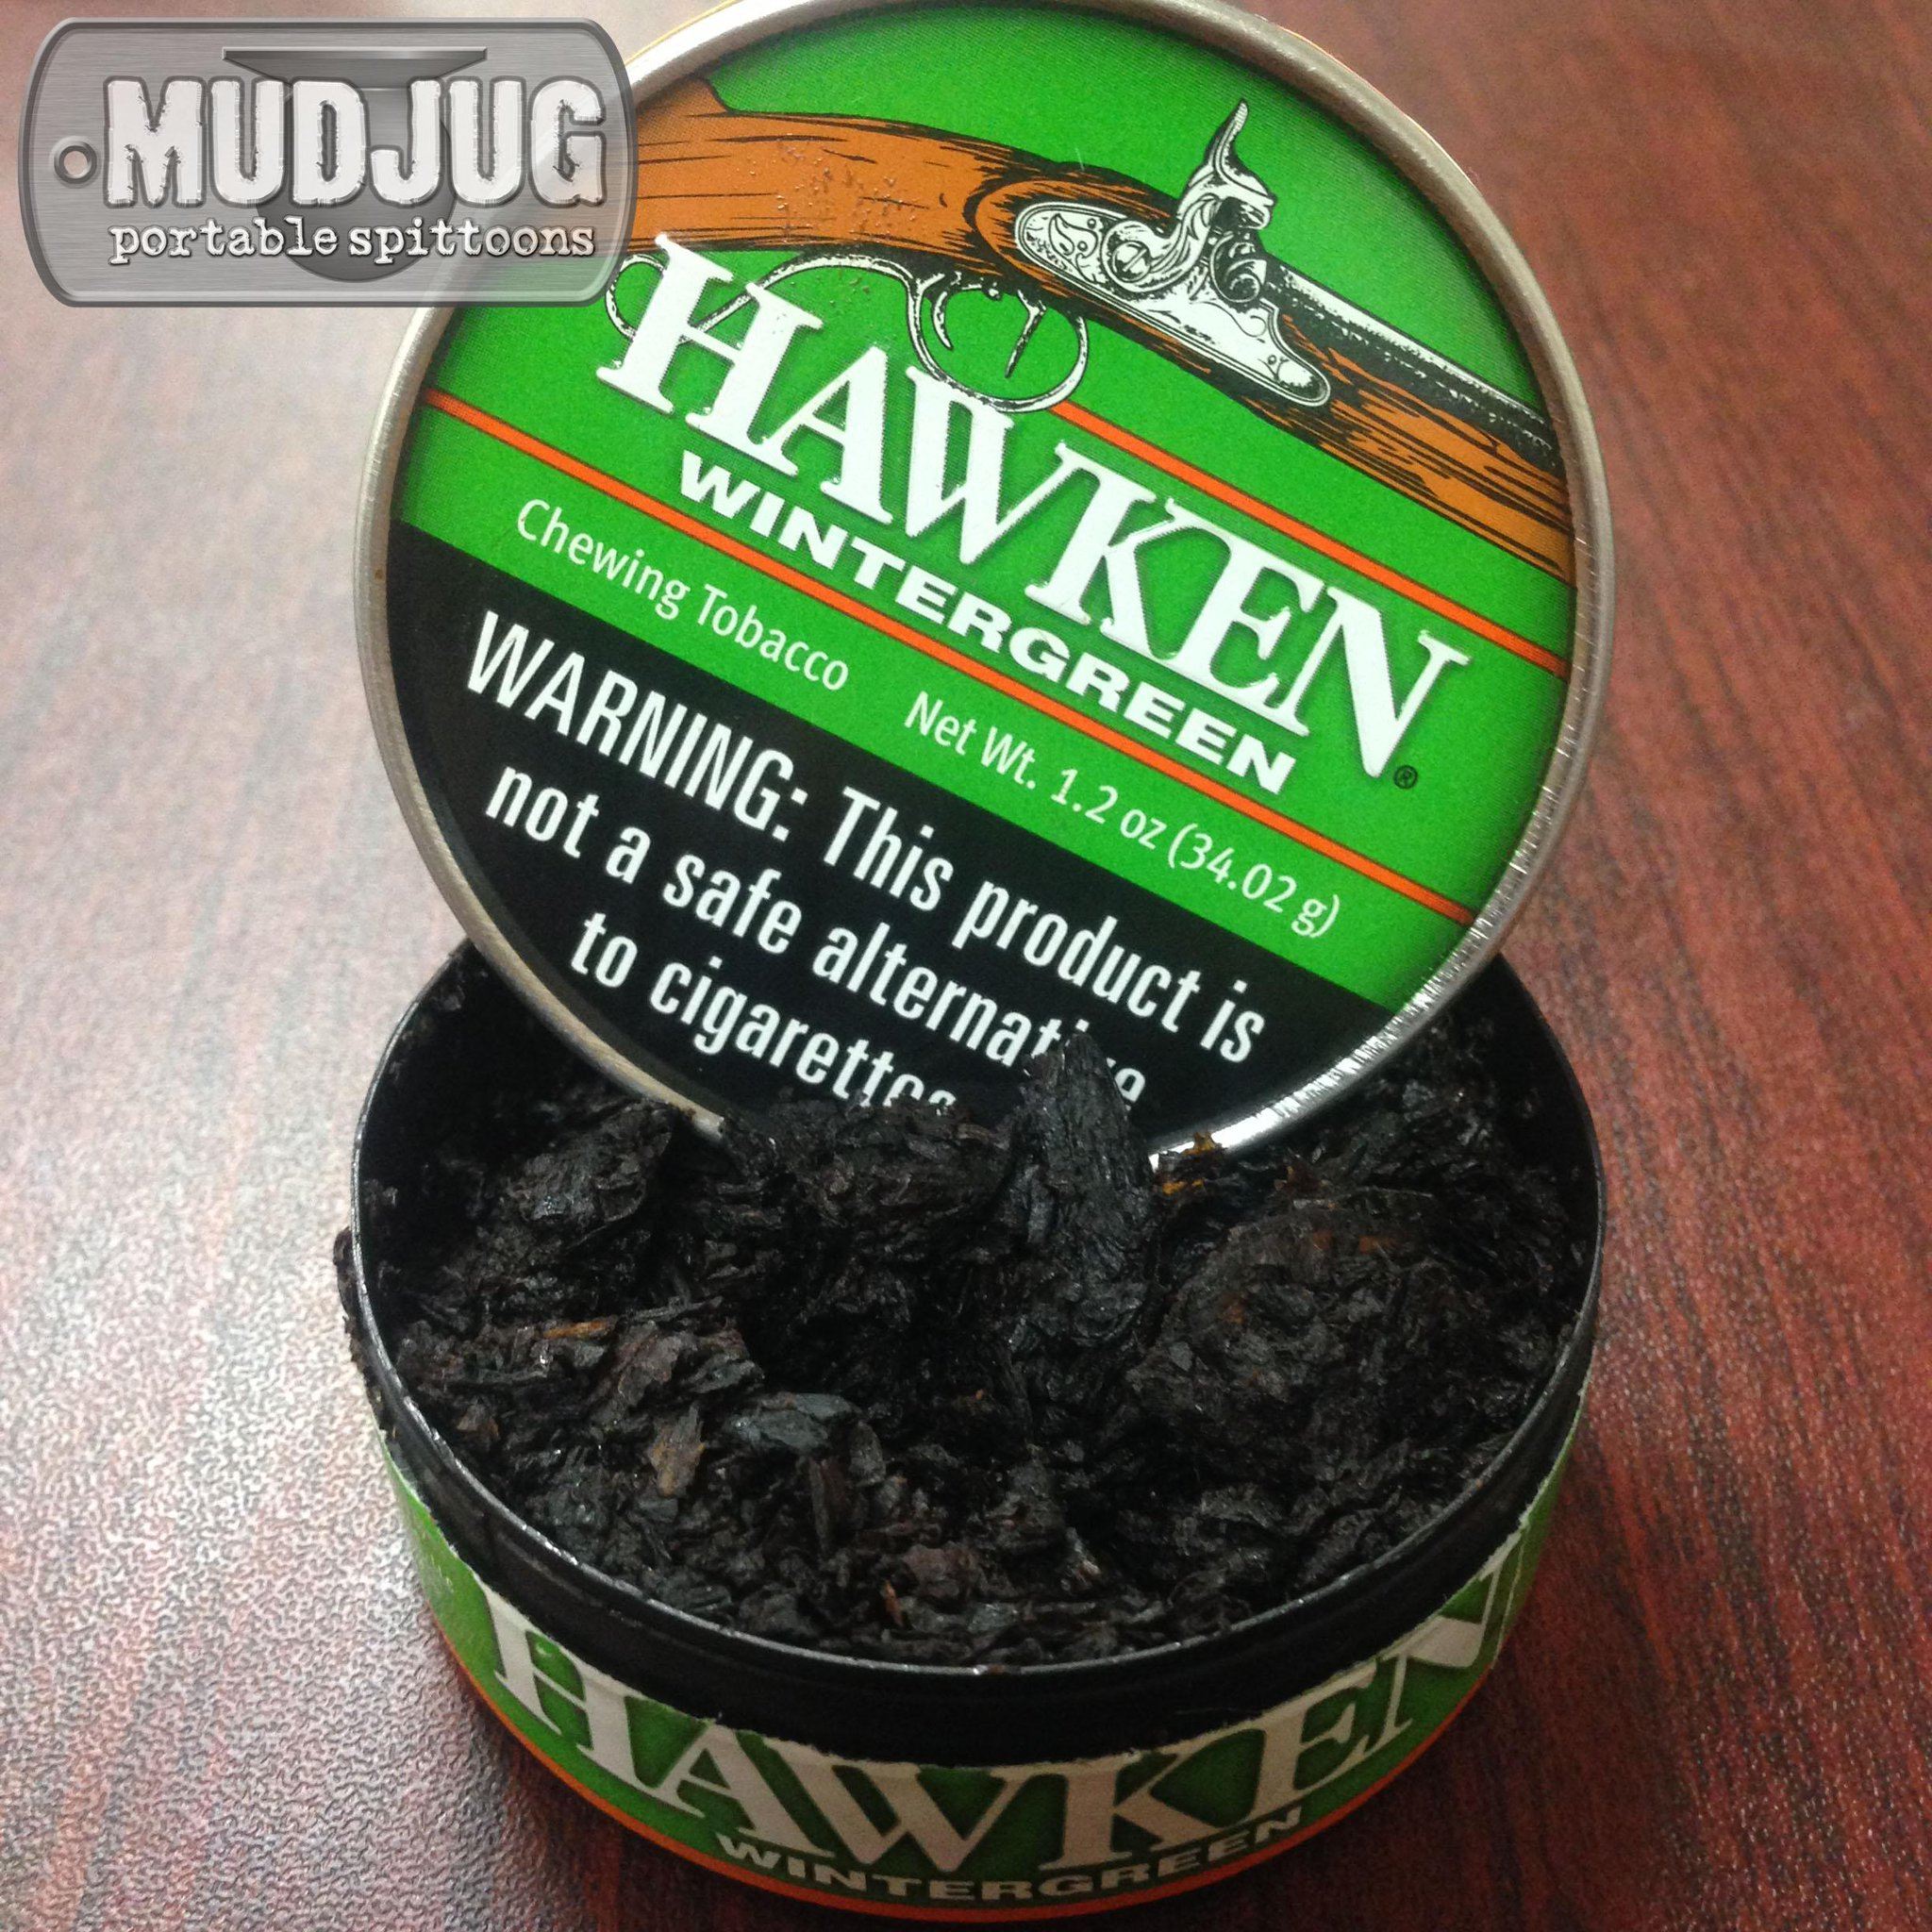 "Darcy MUDJUG Compton on Twitter: ""Hawken Wintergreen..Chew ..."